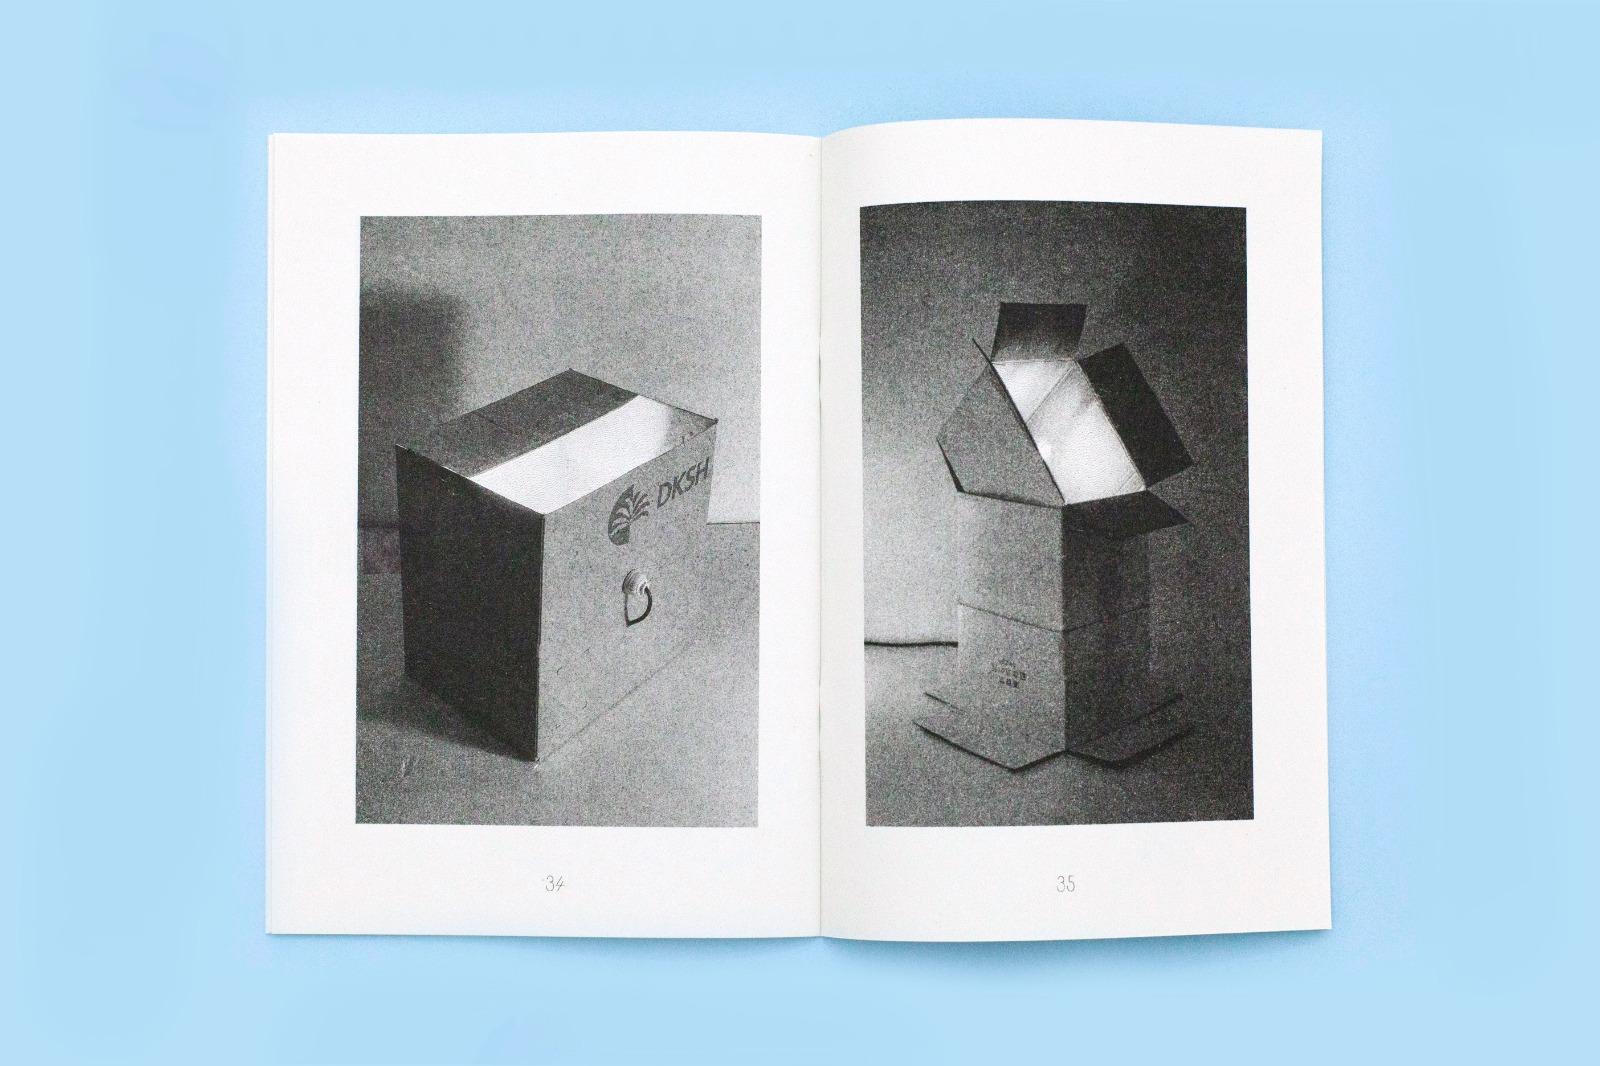 Cardboard Lamps & Adequate Images_book 2